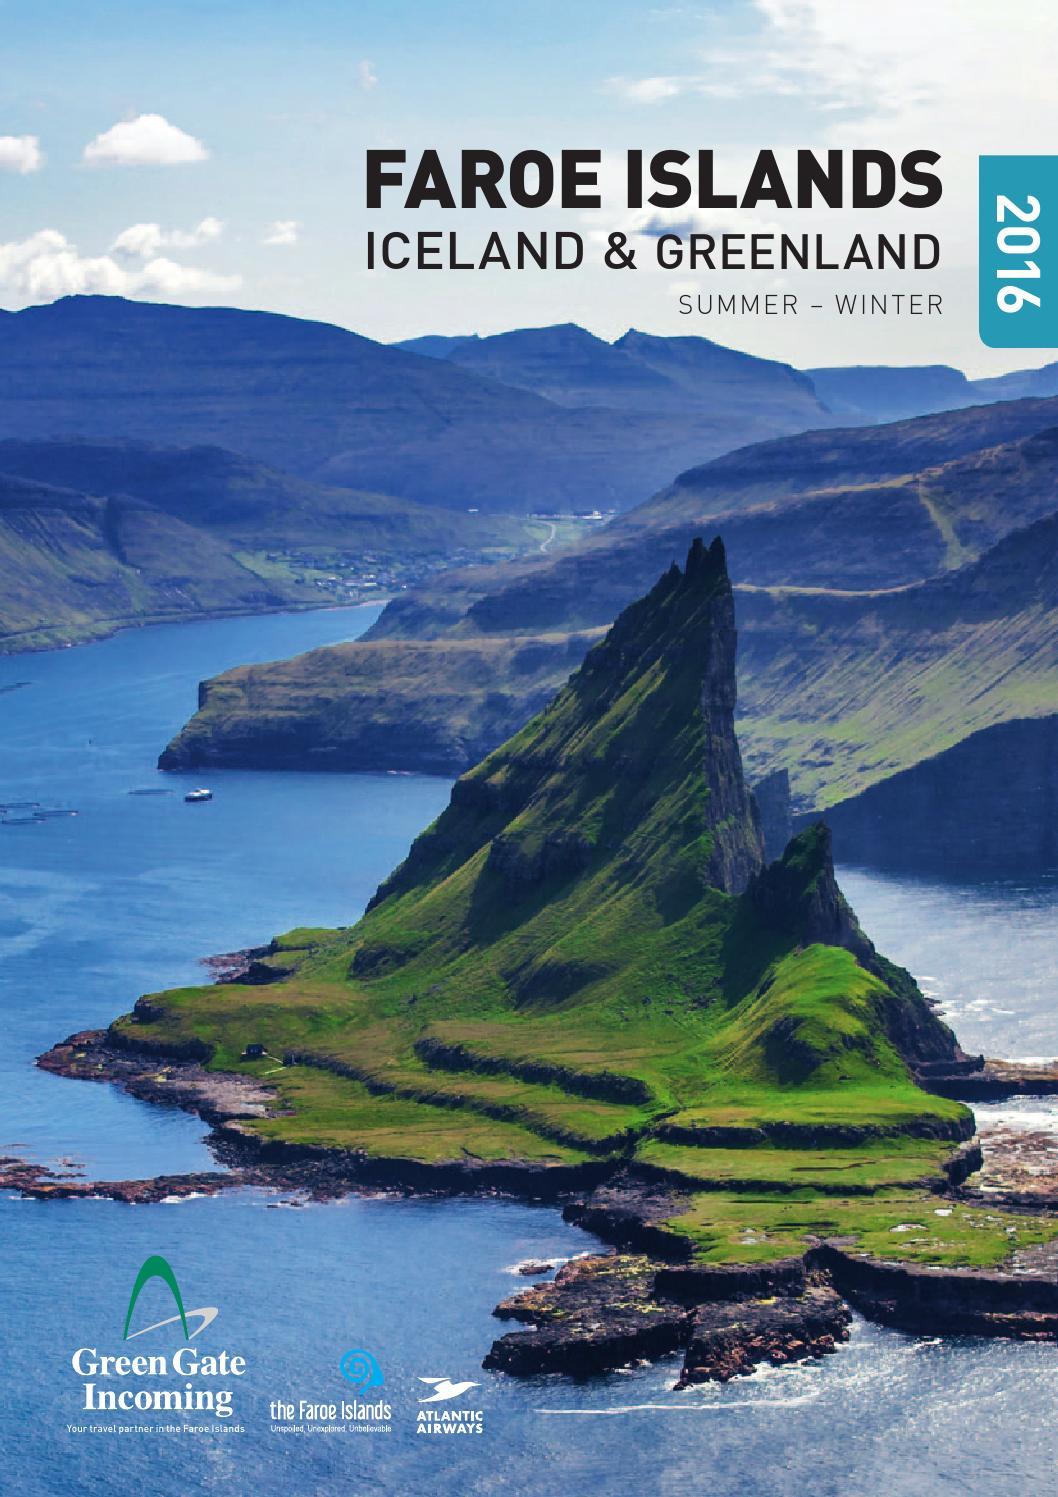 Knitting Holidays Faroe Islands : Package holidays to the faroe islands by greengate